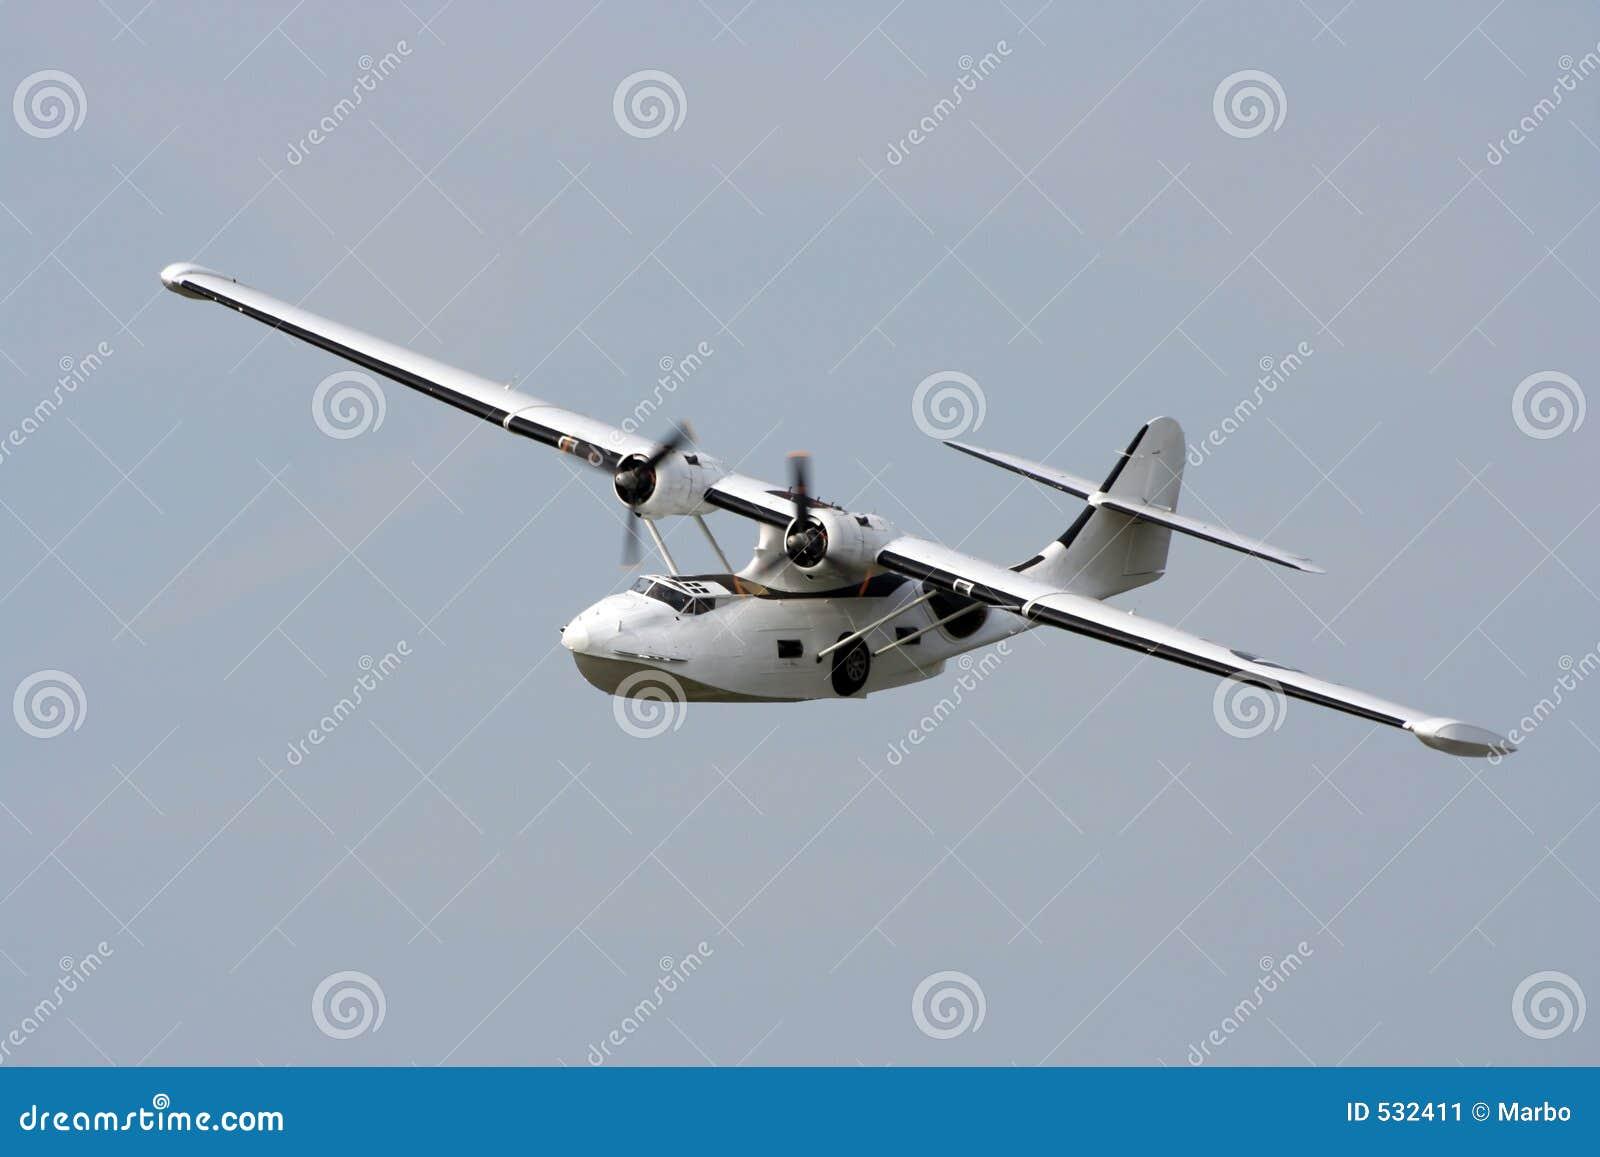 Download 小船catalina飞行 库存图片. 图片 包括有 水上飞机, 小船, 飞行, 有历史, 适航, 海洋, 海运 - 532411